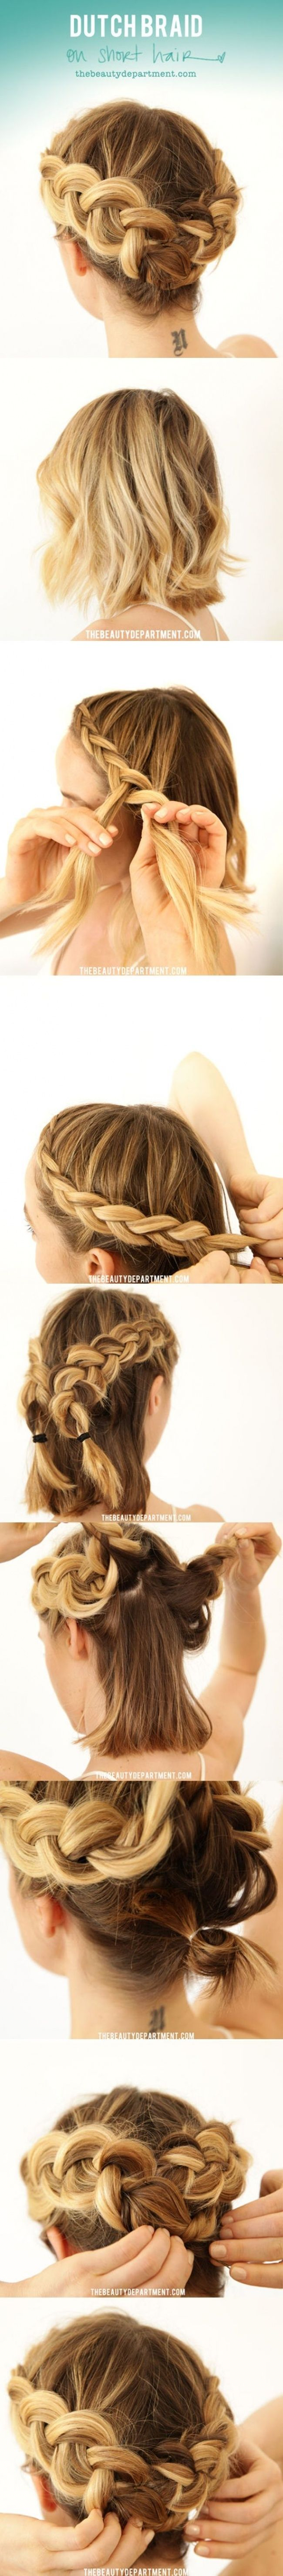 14 penteados fantásticos para cabelos cacheados e curtos